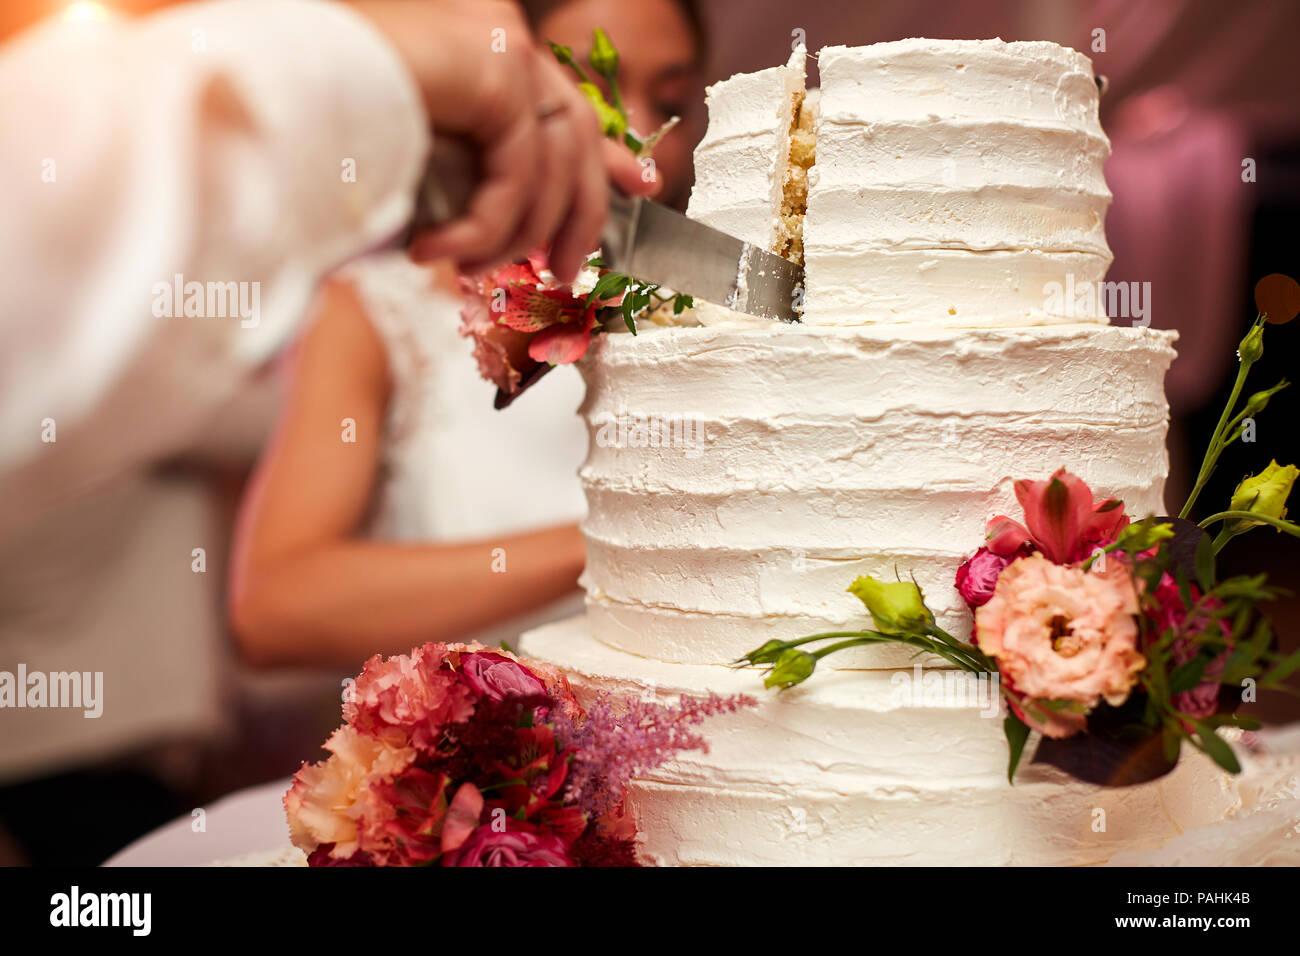 Groom coupe le gâteau de mariage Photo Stock